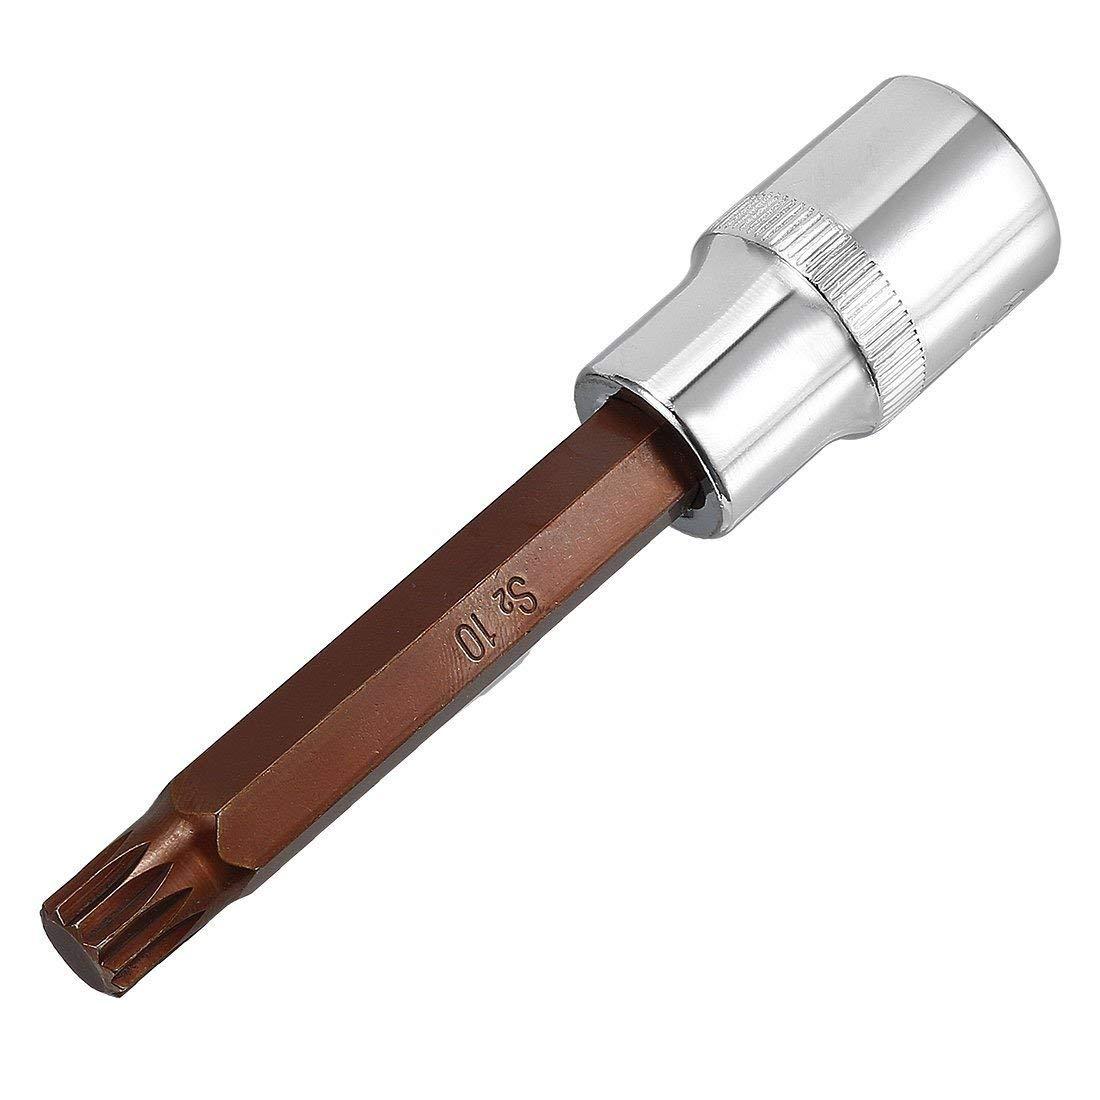 uxcell 1//2-Inch Drive x M10 Triple Square Spline Bit Socket Metric 2 Length